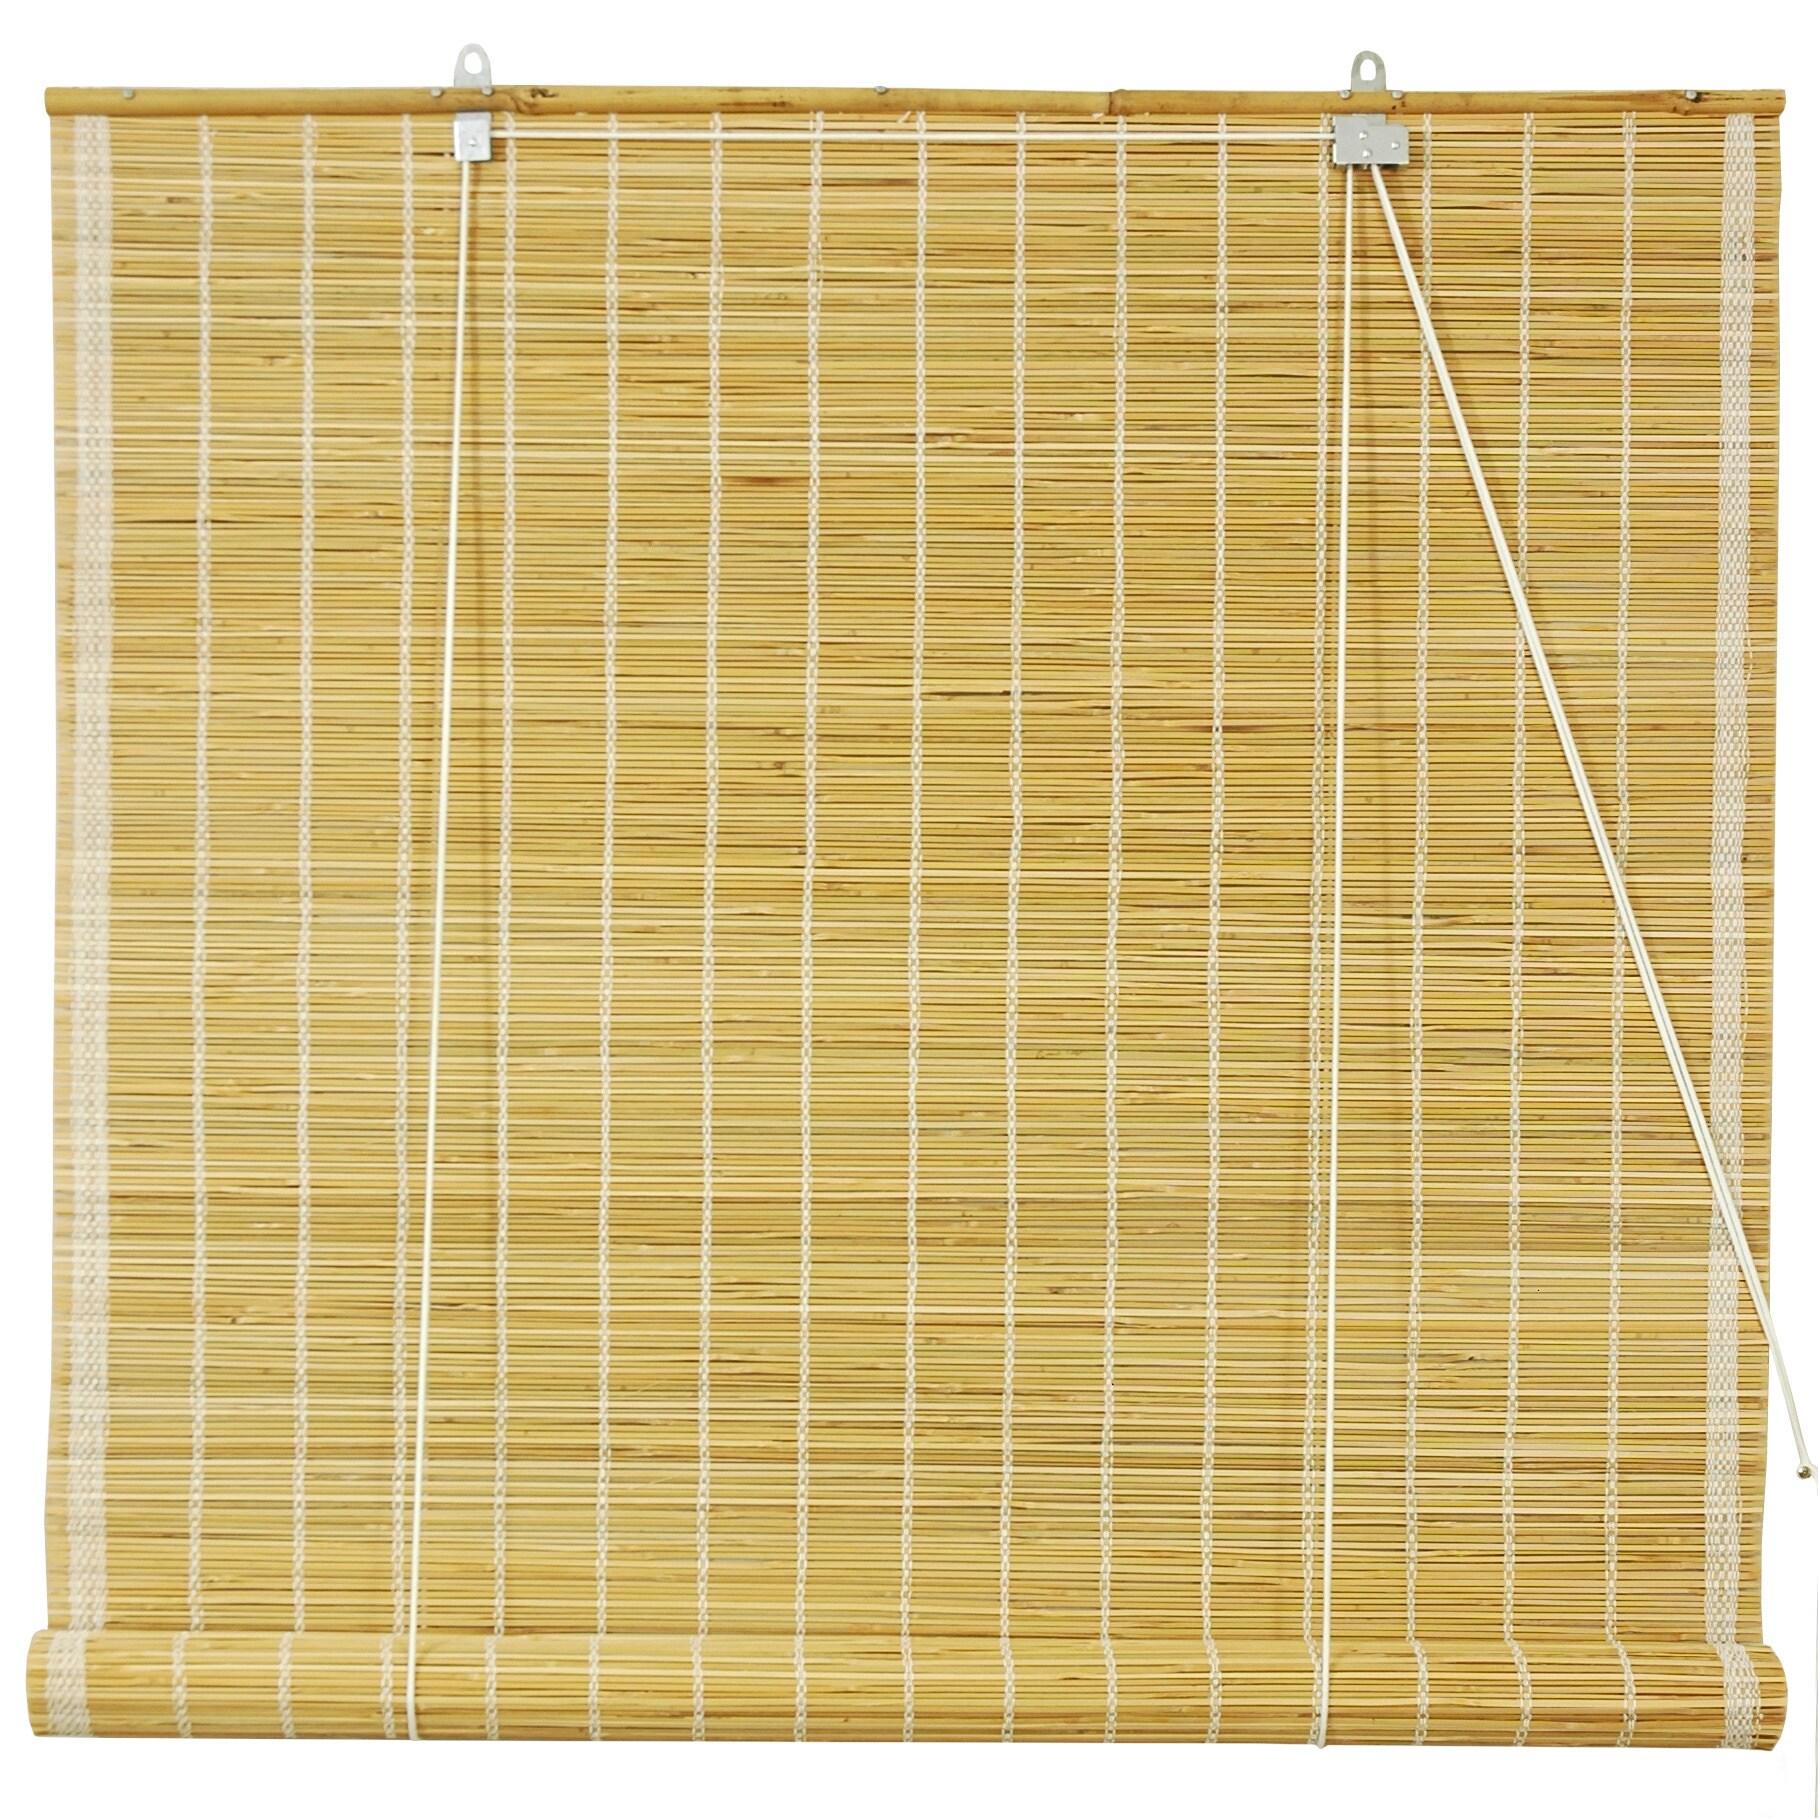 Handmade 24-inch Natural Matchstick Roll Up Blinds (China...